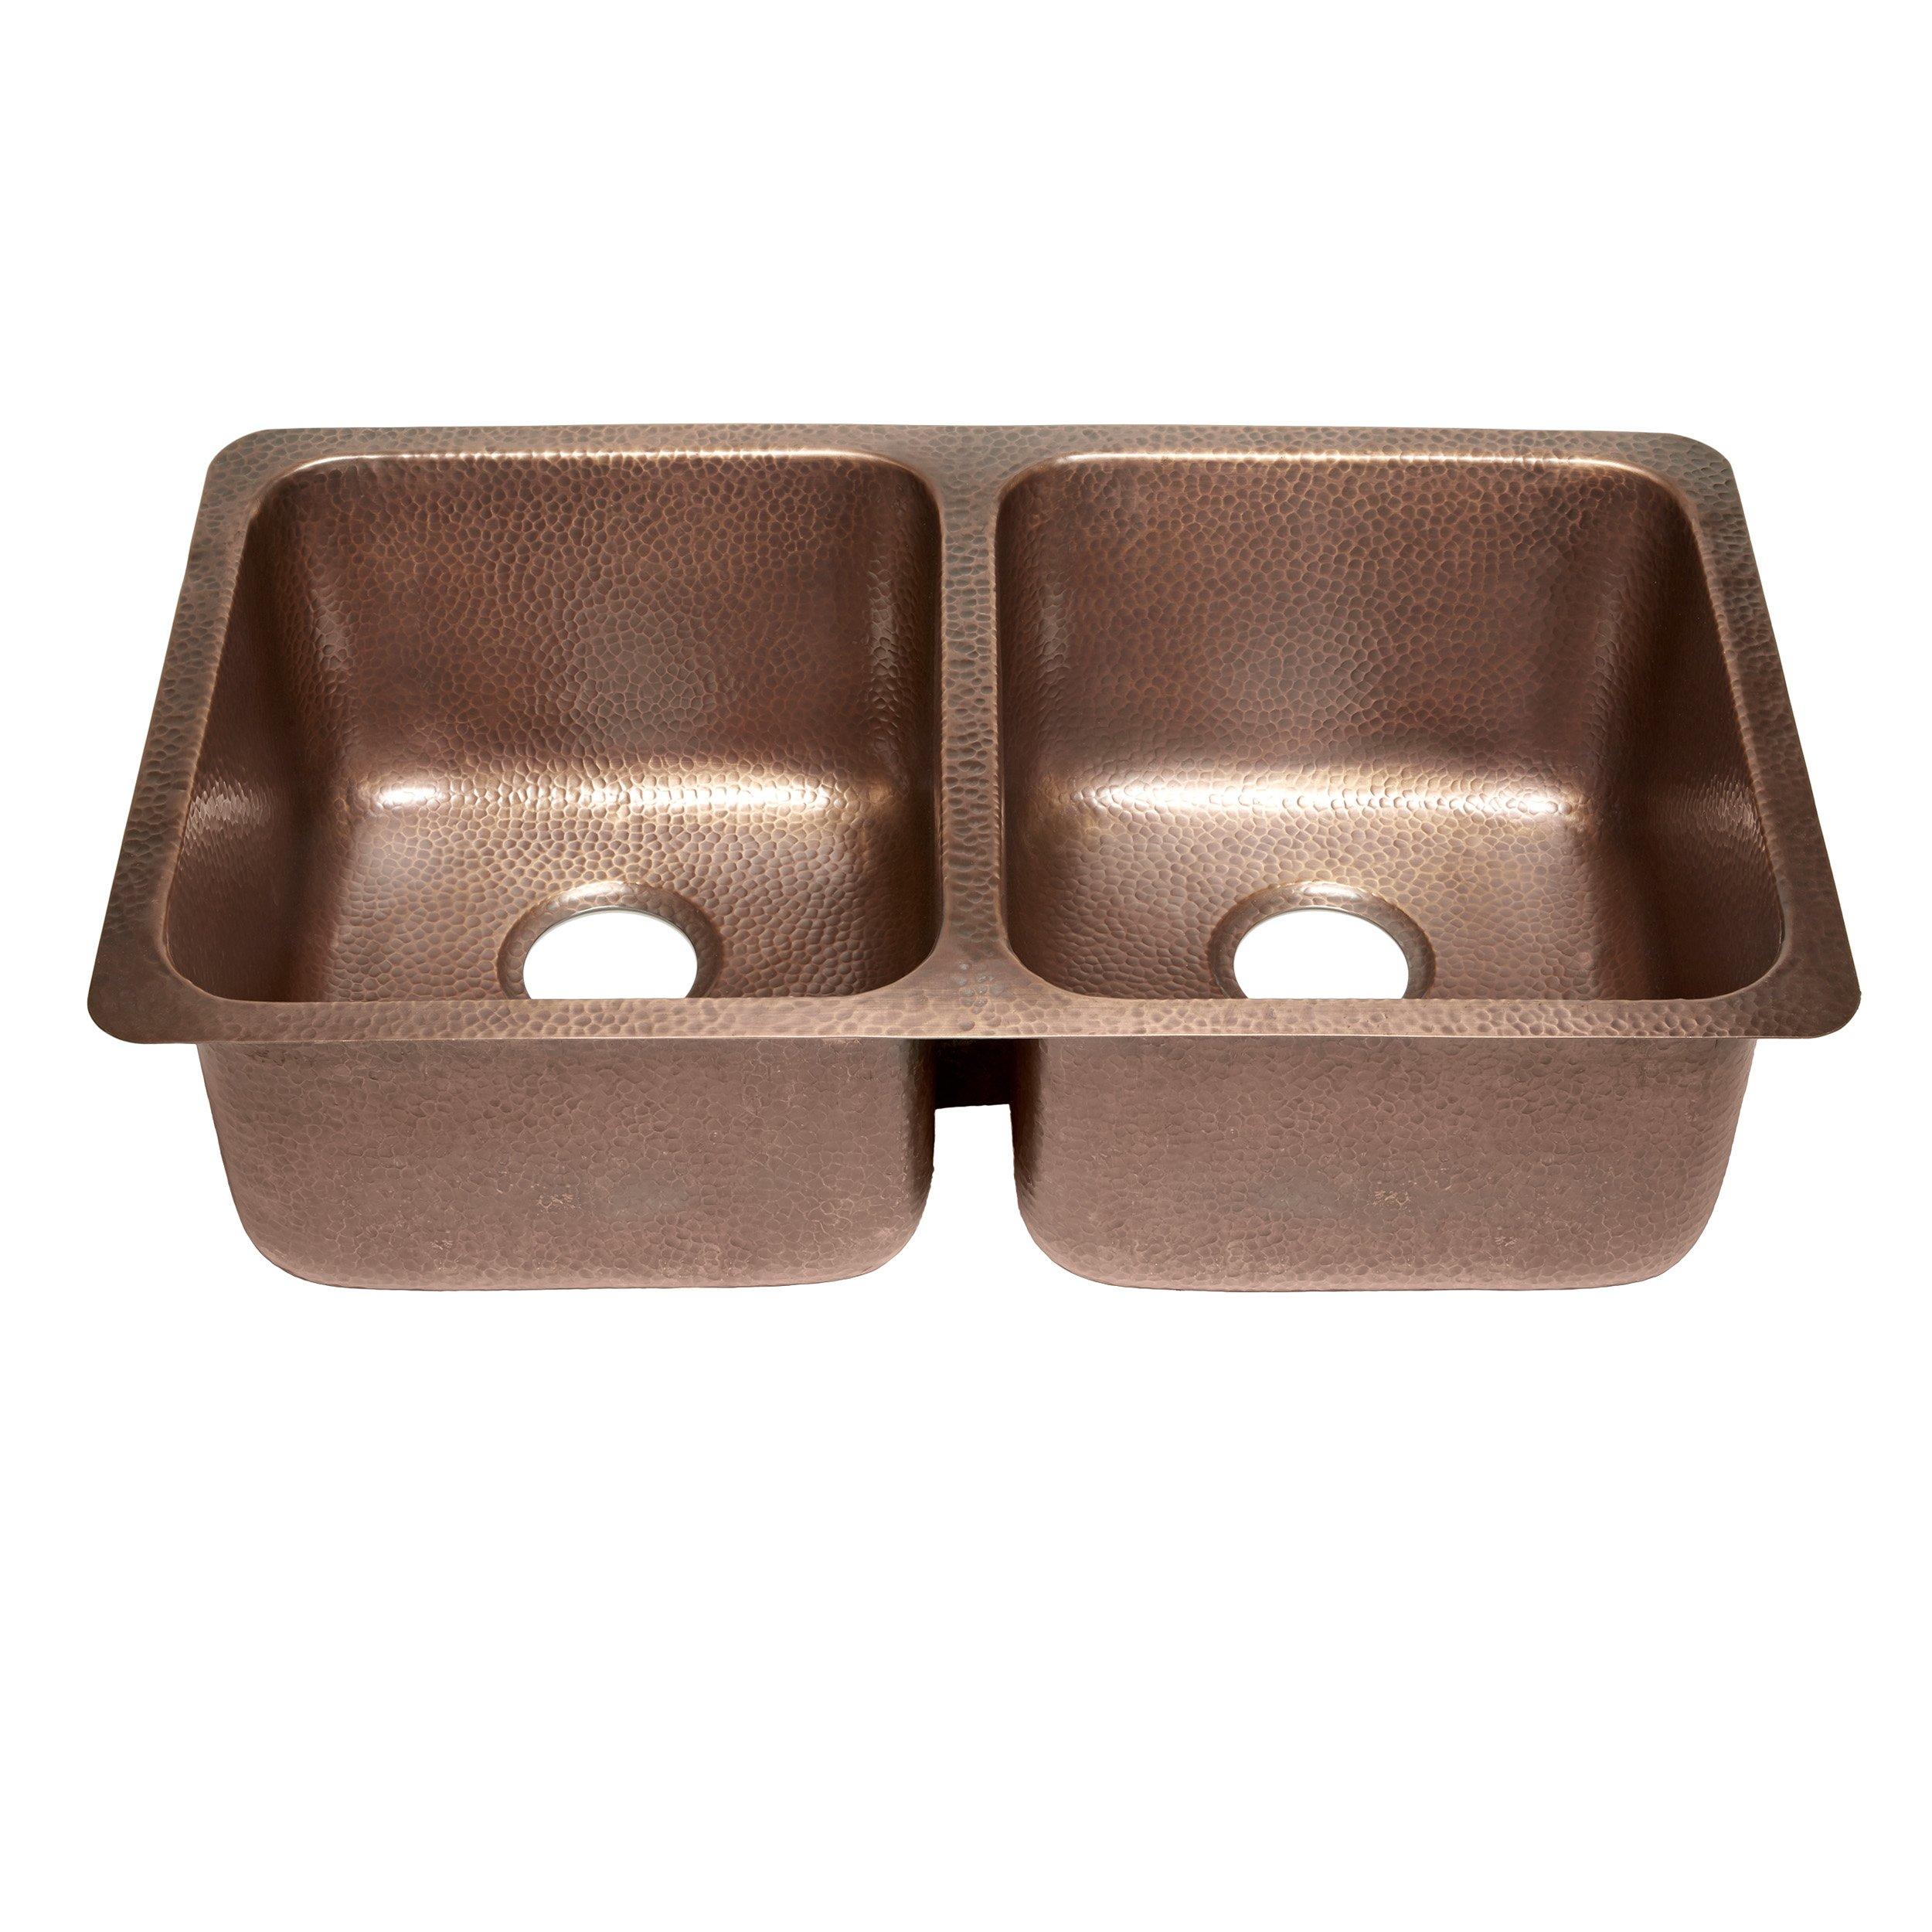 Sinkology SK204-32AC Rivera Luxury Series Undermount Handmade Pure Copper Double Bowl Kitchen Sink, 32-1/4'', Antique Copper